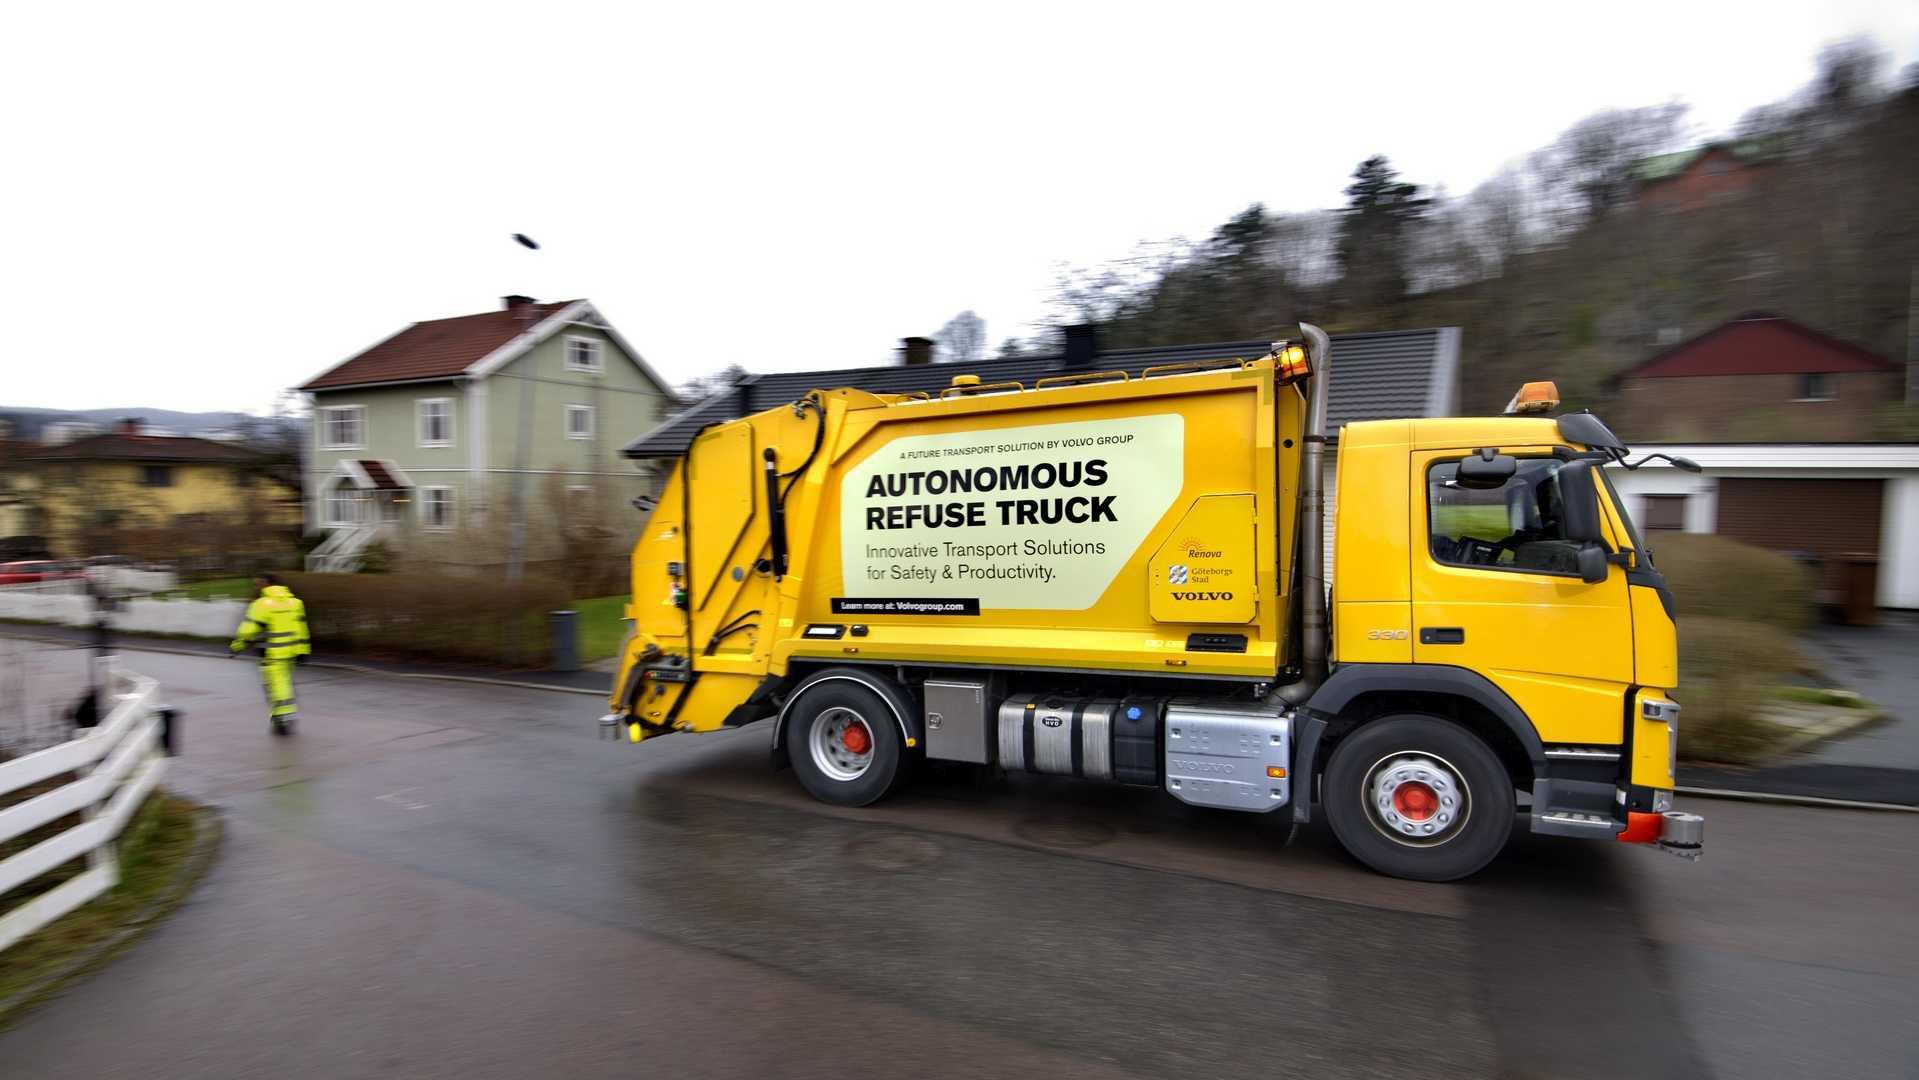 Volvo autonomous garbage truck (4)